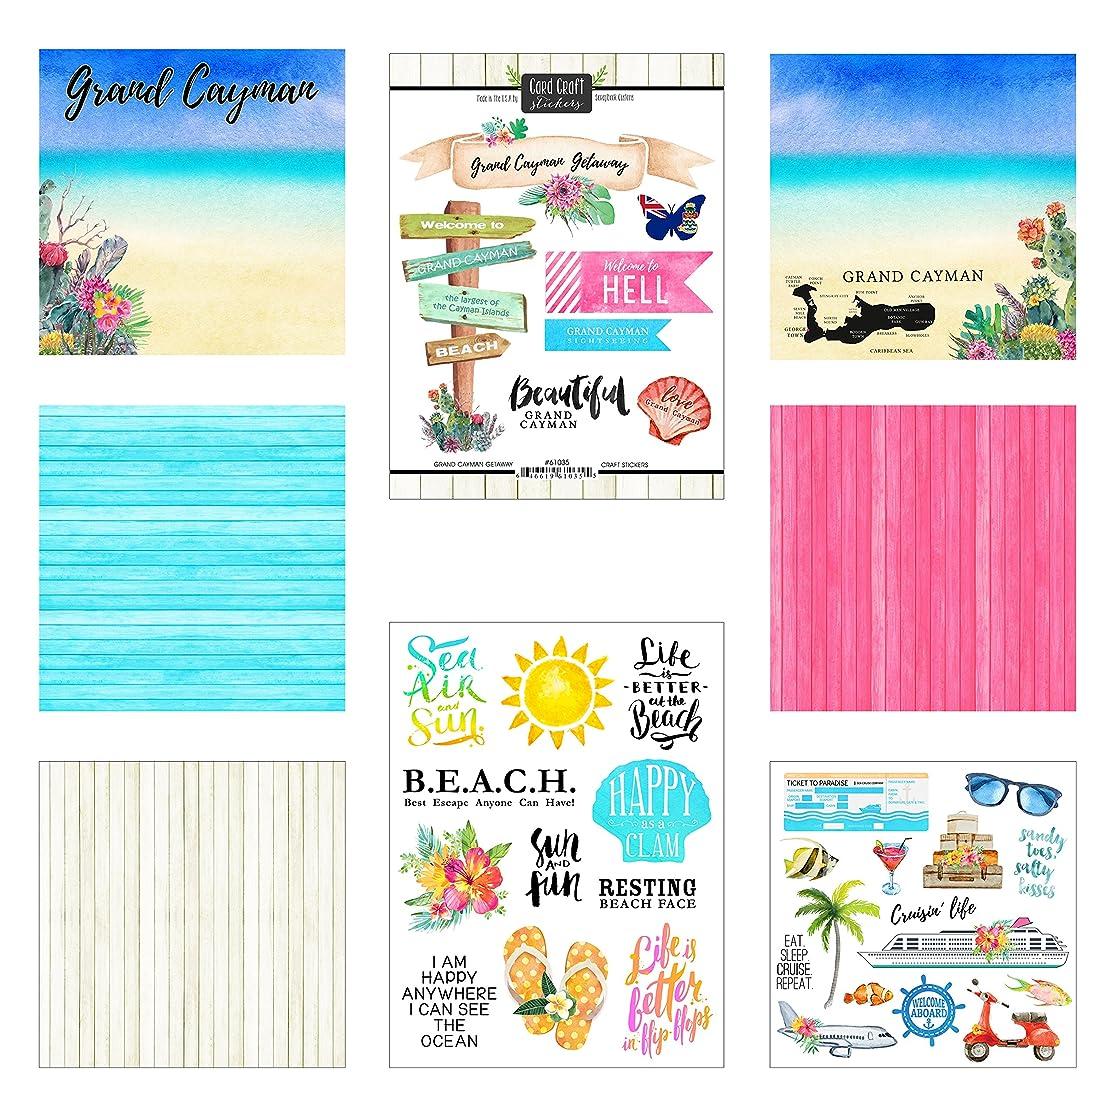 Scrapbook Customs Grand Cayman Getaway Scrapbook Kit